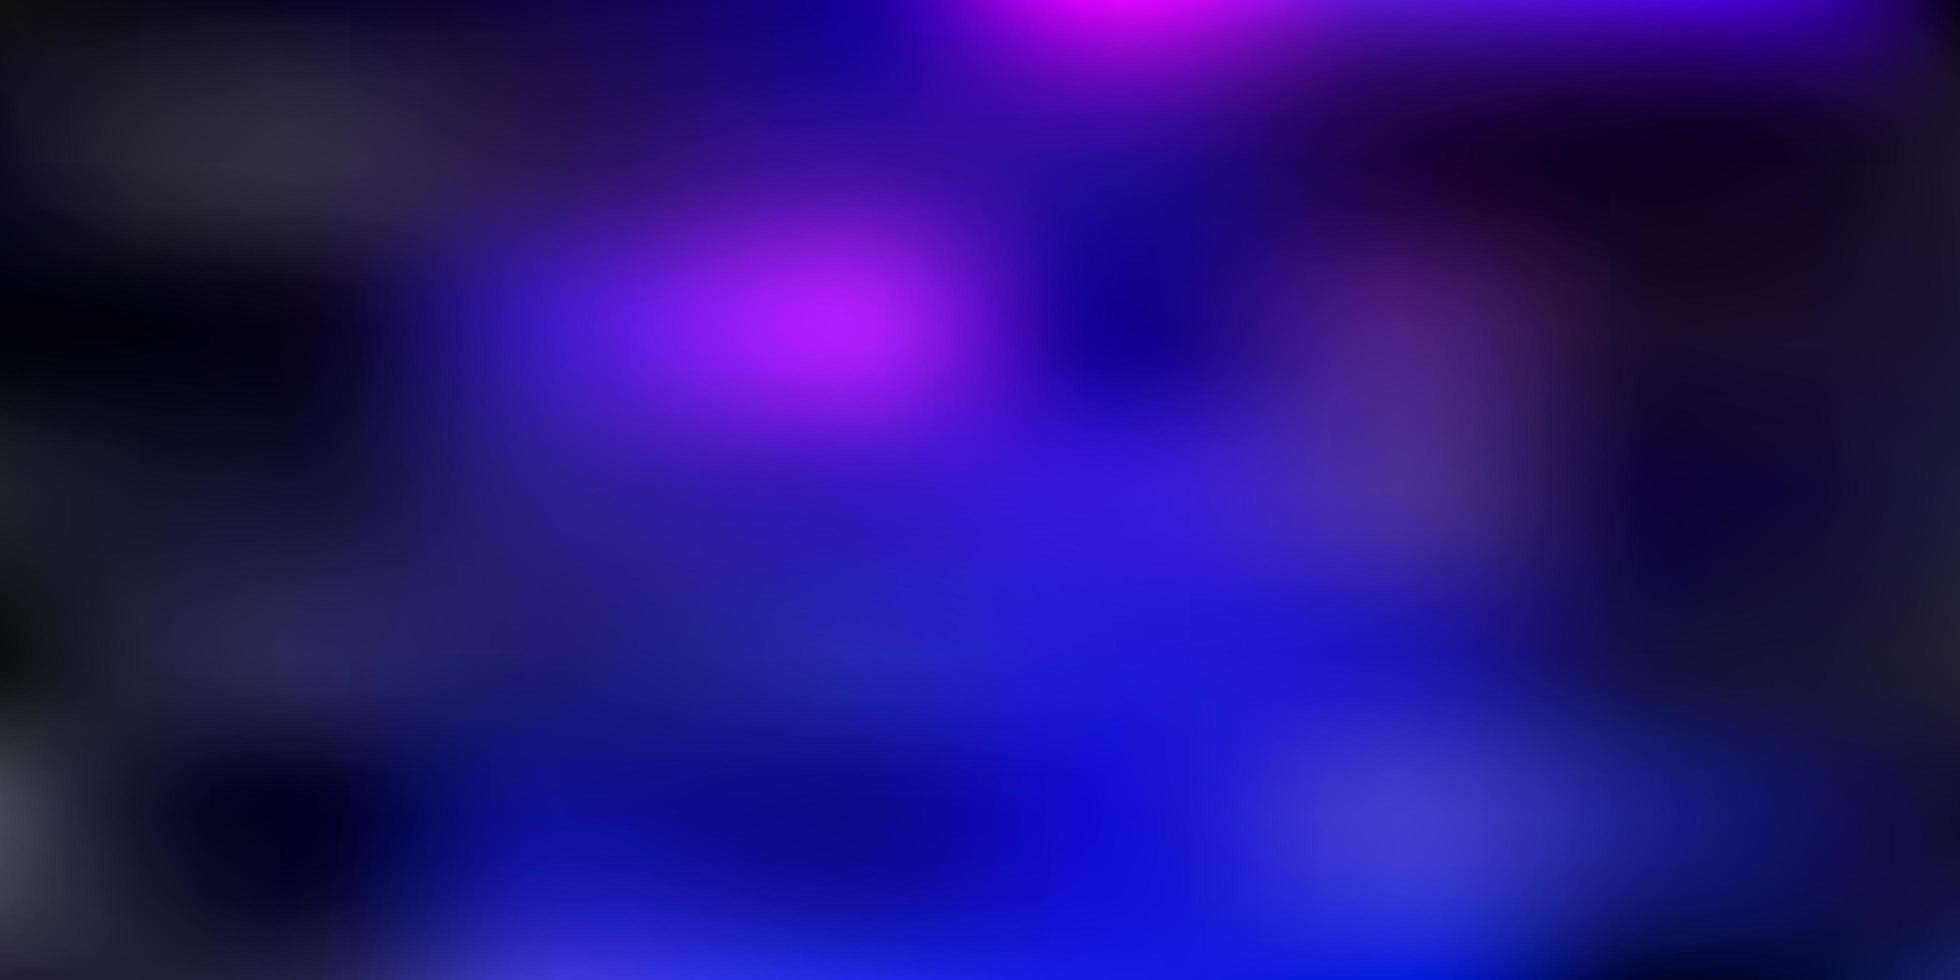 modelo de borrão gradiente de vetor rosa escuro e azul.